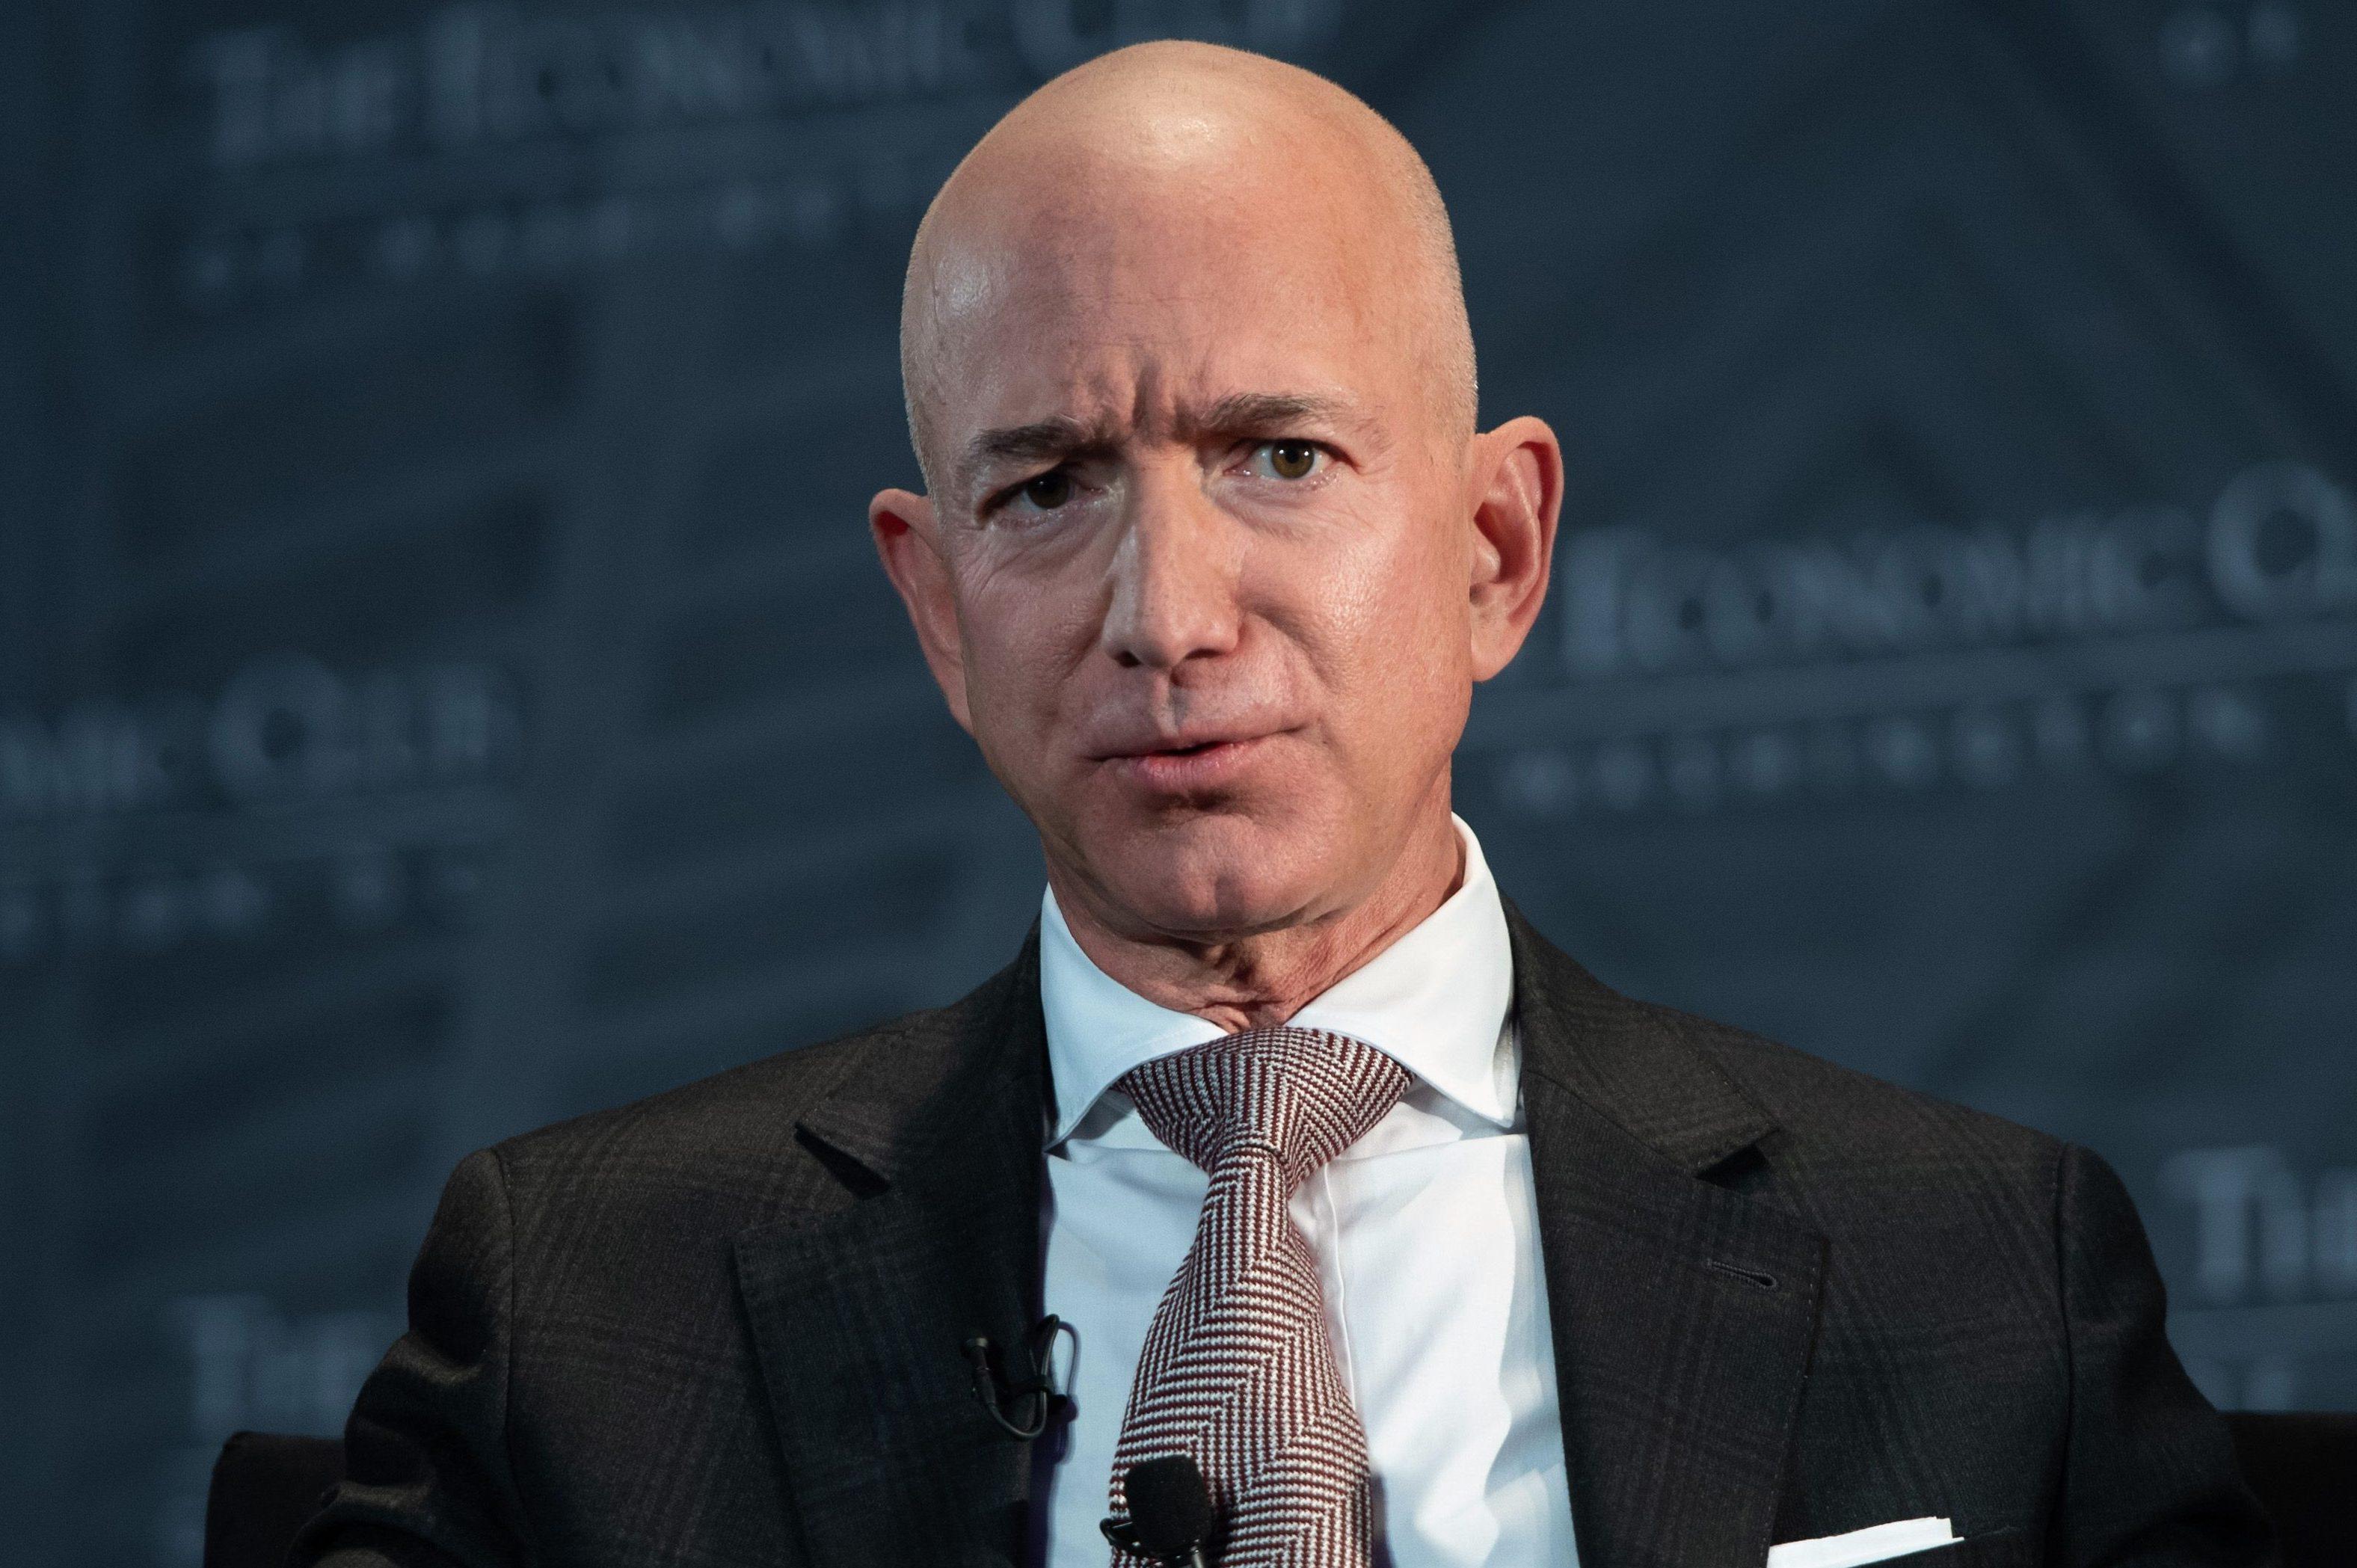 Jeff Bezos Phone Hack Saudi Crown Prince Mbs Alleged Culprit Observer